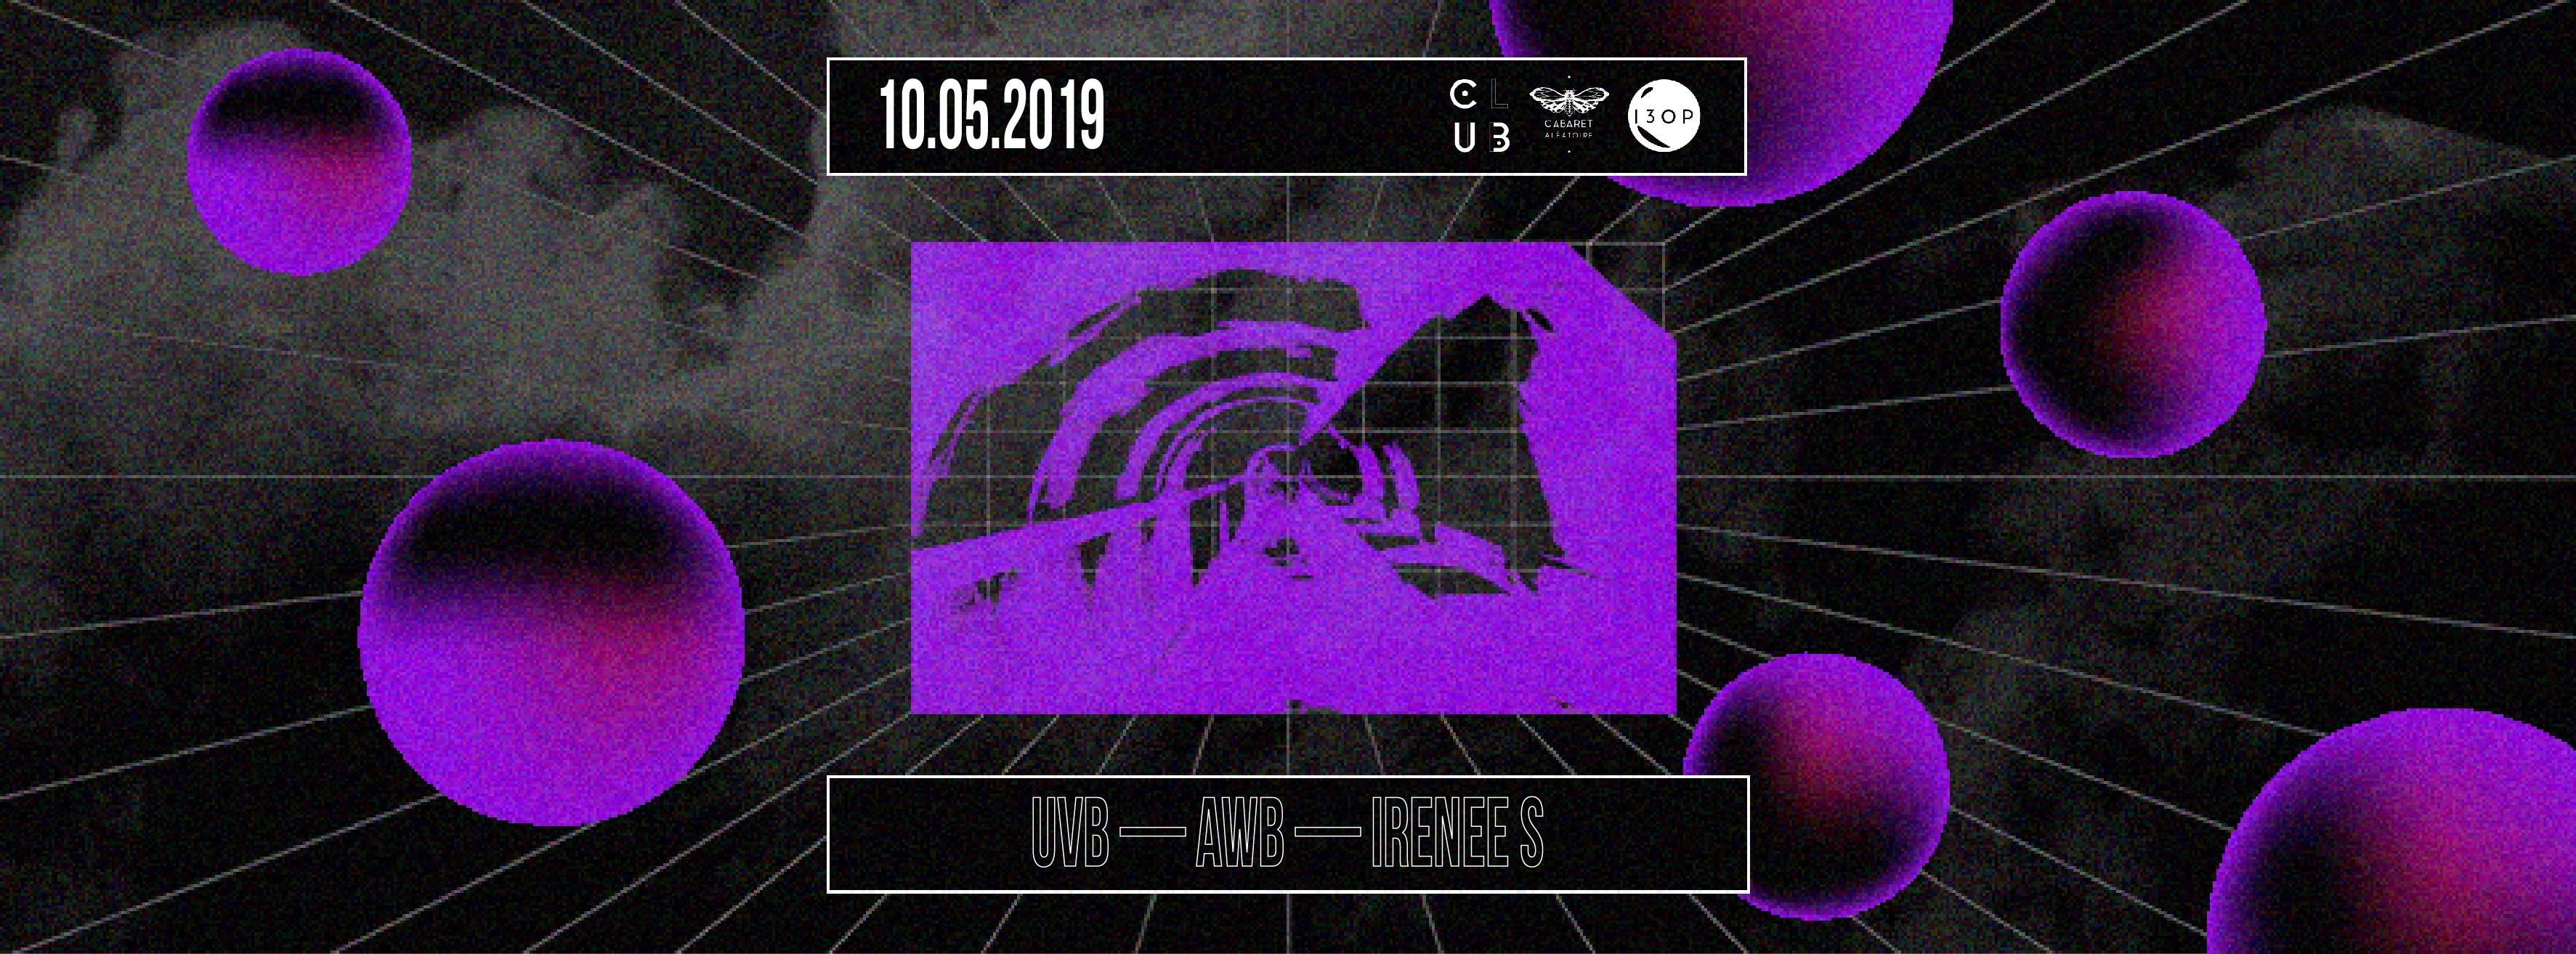 Club Cabaret x 13 OP : UVB + AWB + Irenee S